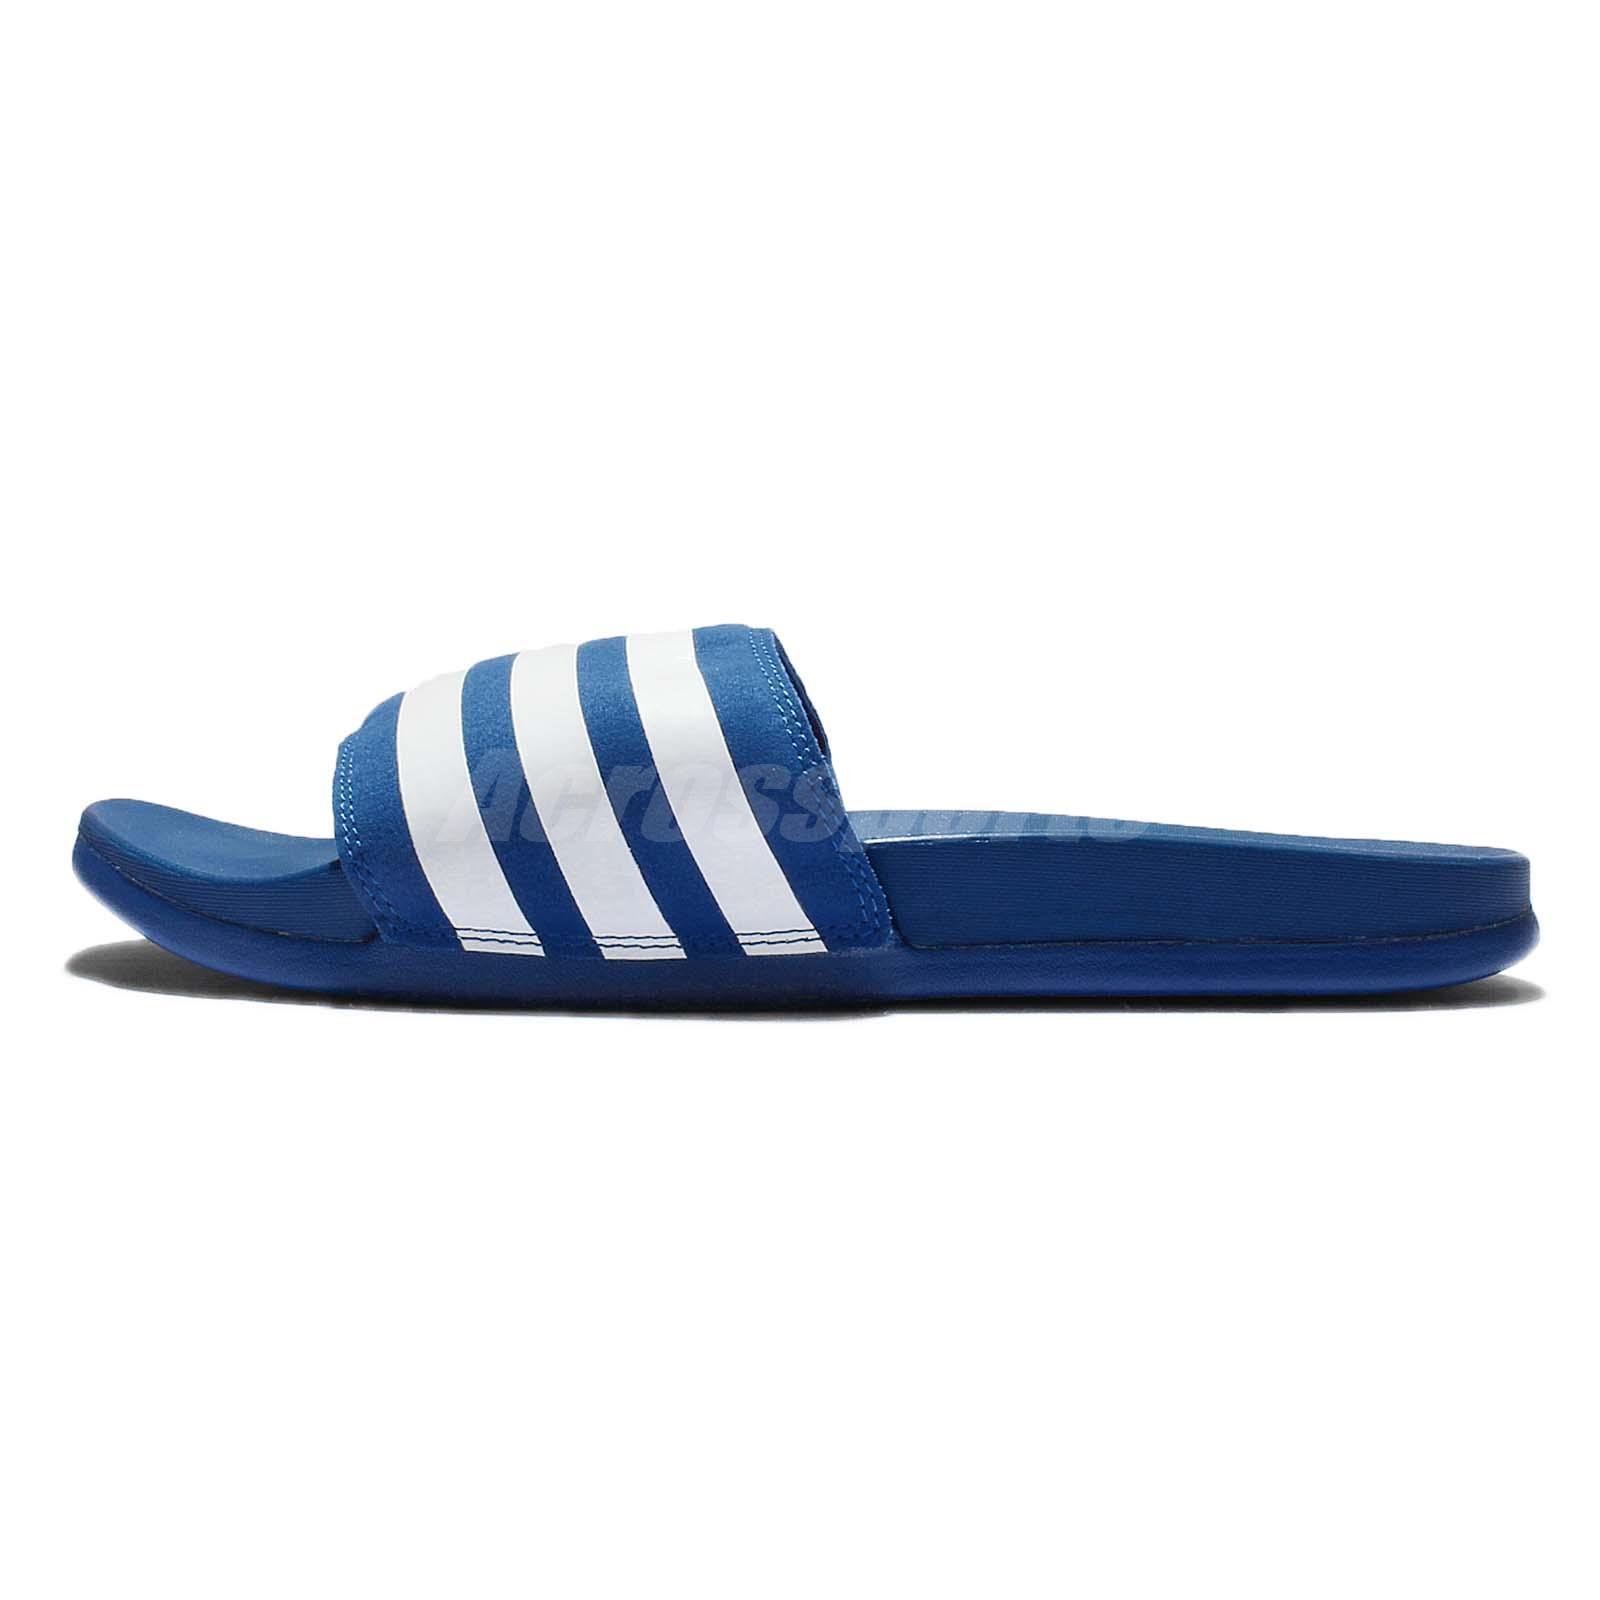 67aa11488c37 adidas Adilette CF Ultra Supercloud Plus Slides Blue White Mens Sandal  AQ4936